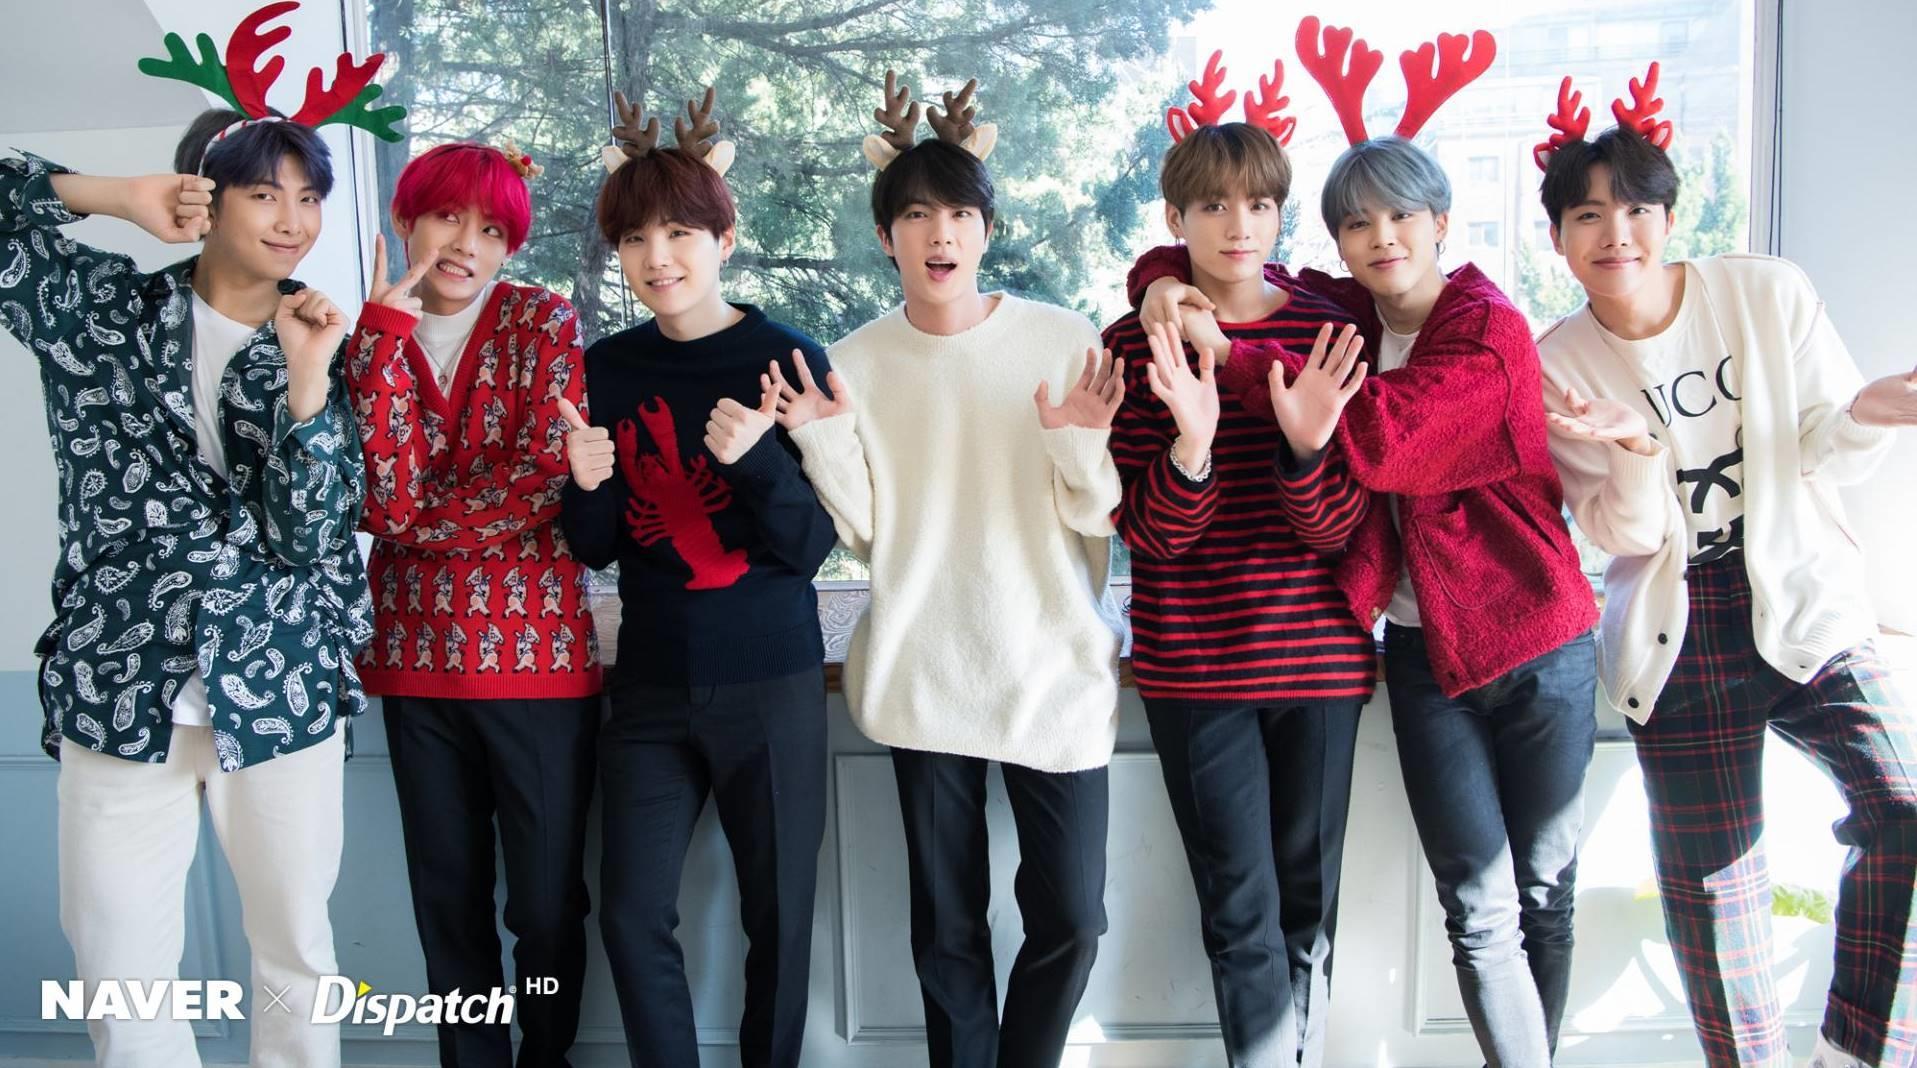 BTS BTS Wallpaper 41811926 Fanpop